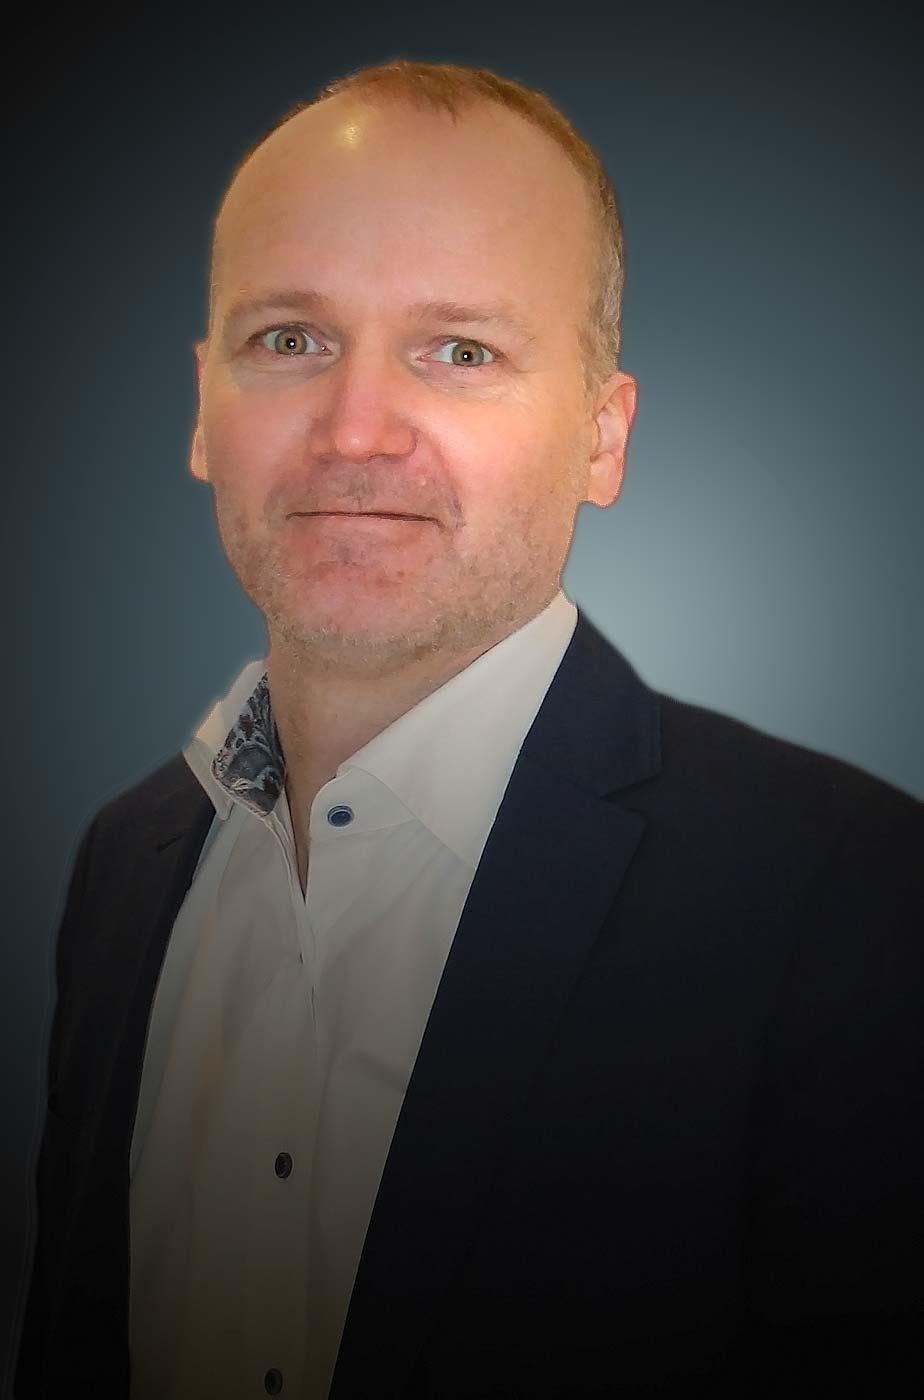 Albert Olofsson